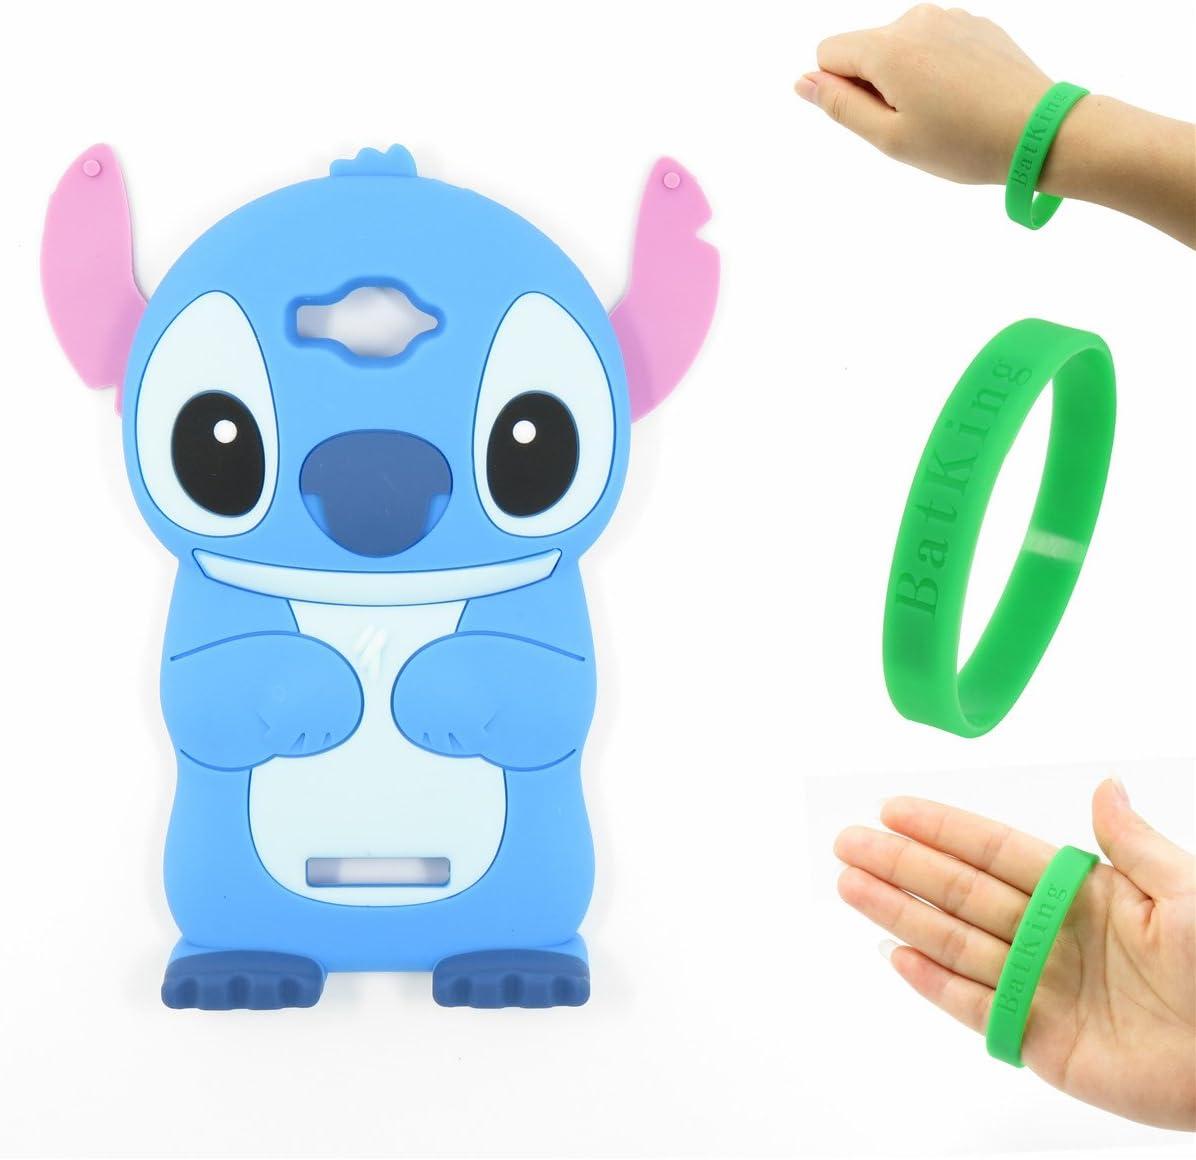 Funda para Alcatel One Touch Pop C7, Bat King 3D, diseño de búho Vivo con Dibujos Animados, de Goma de Silicona Suave, para Alcatel One Touch Pop C7 OT-7040E/7040A/7040X/7040F/7040D (búho Azul): Amazon.es: